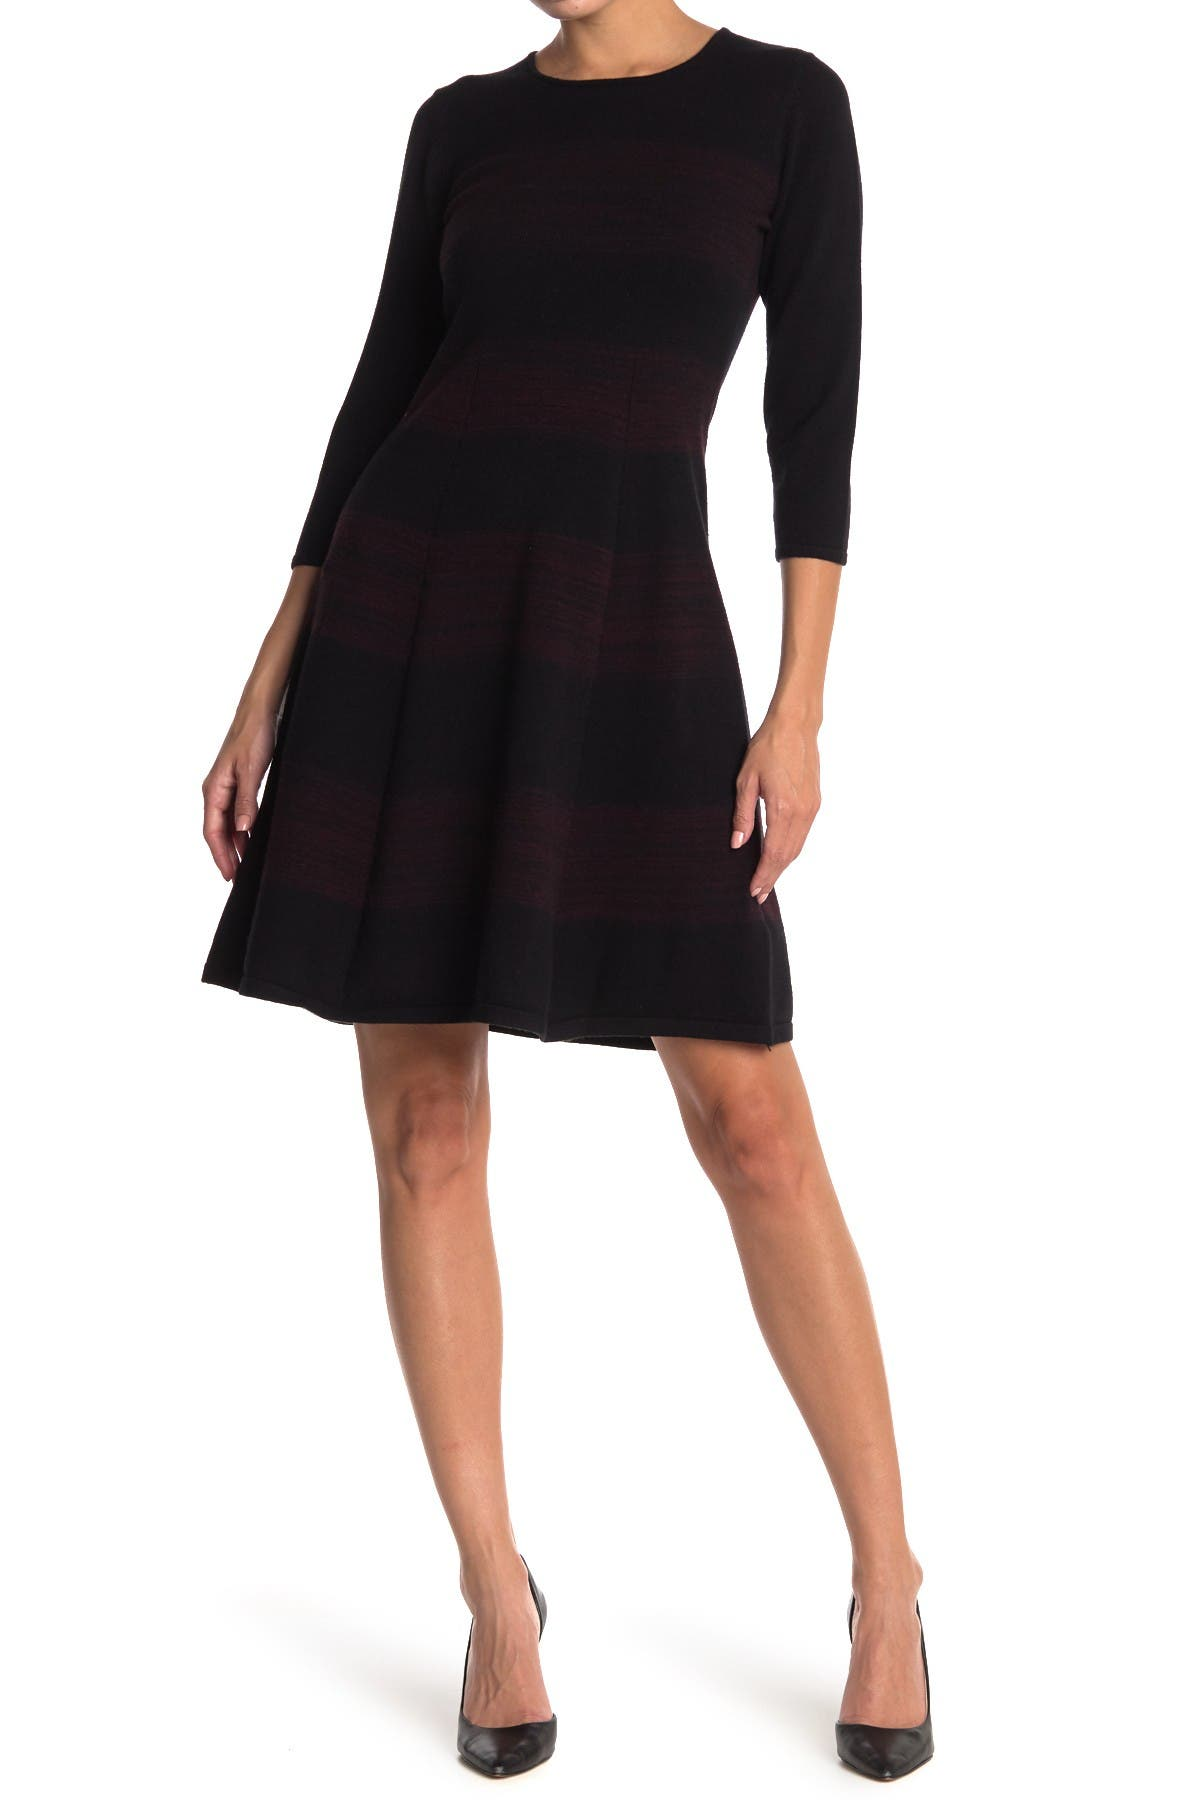 Image of T Tahari Striped 3/4 Sleeve Fit & Flare Dress